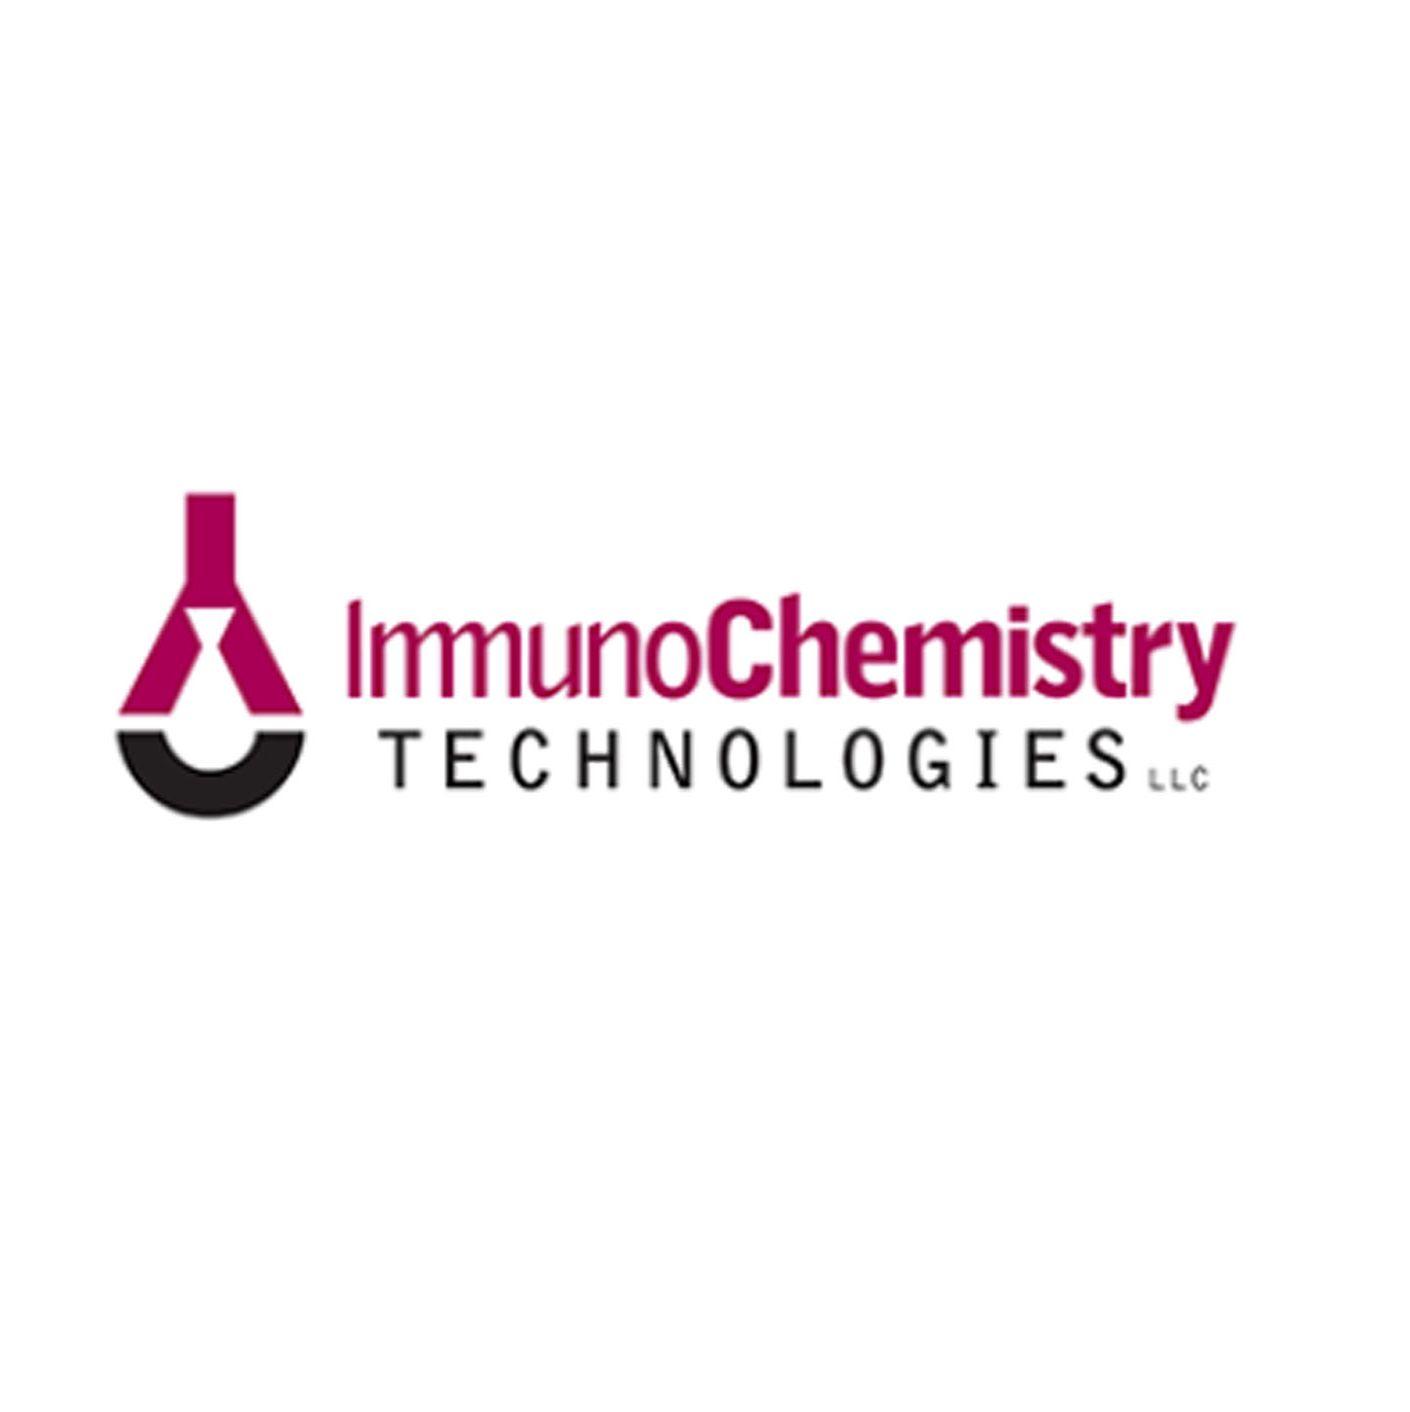 ImmunoChemistry Technologies(ICT)9135 Glutathione Colorimetric Detection Kit,谷胱甘肽比色检测试剂盒,4 96-well plates,现货